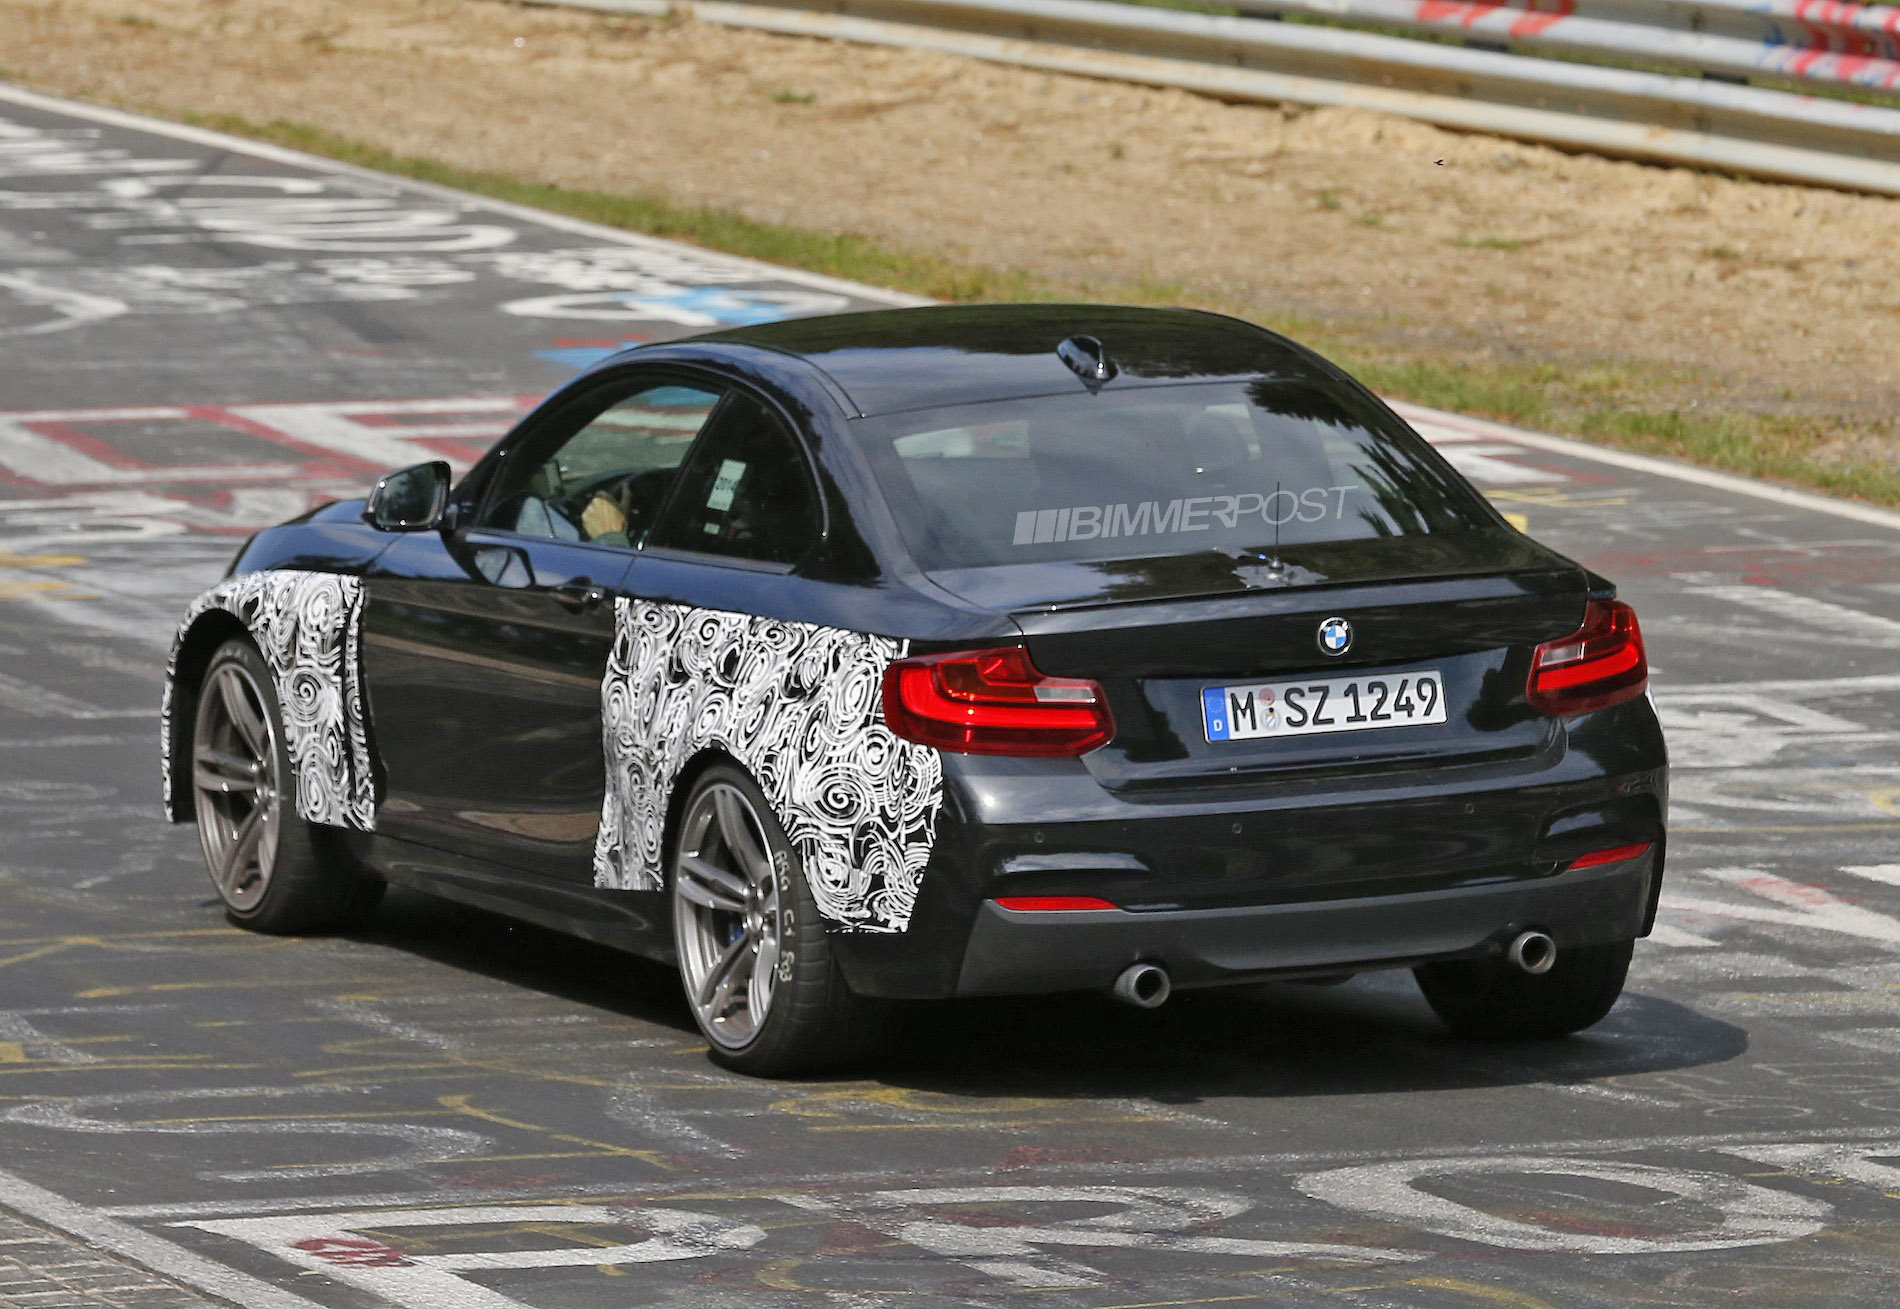 2016 - [BMW] M2 [F87] - Page 3 M2%20Ring%207